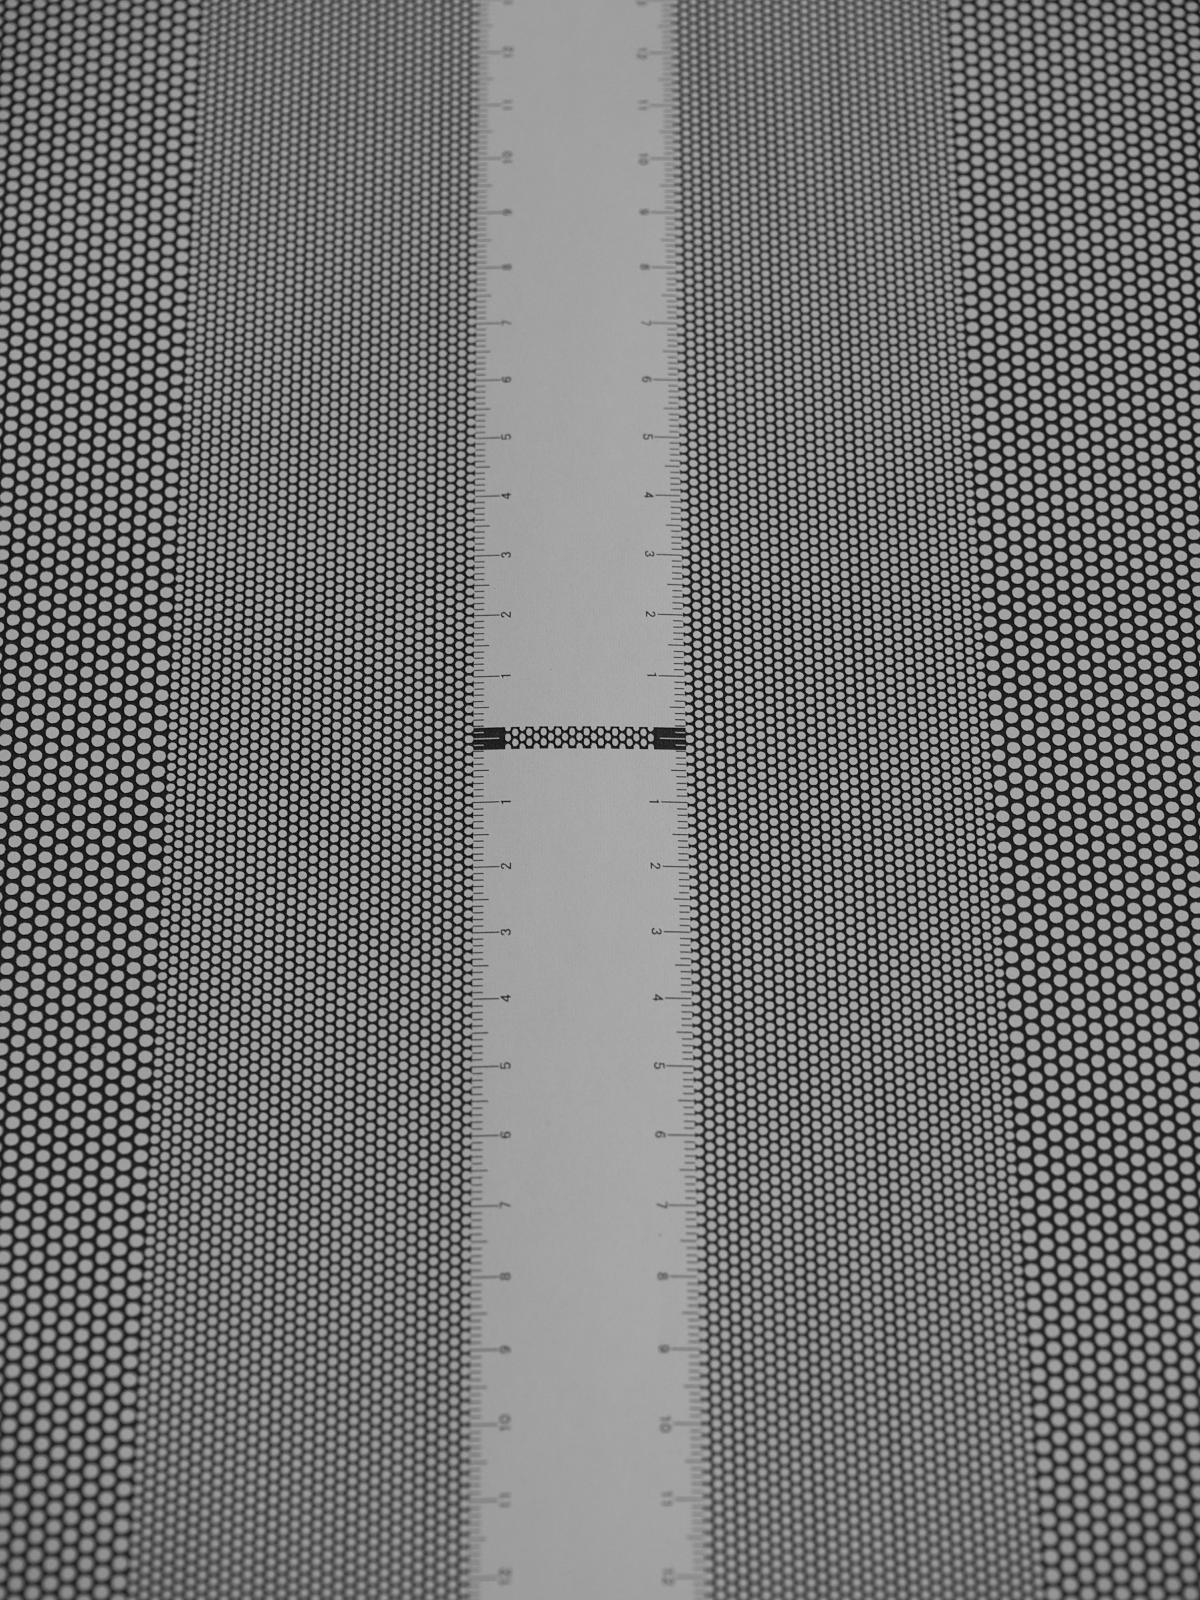 LEICA DG MACRO-ELMARIT 45mm F2.8 レンズ性能_b0161171_10533235.jpg